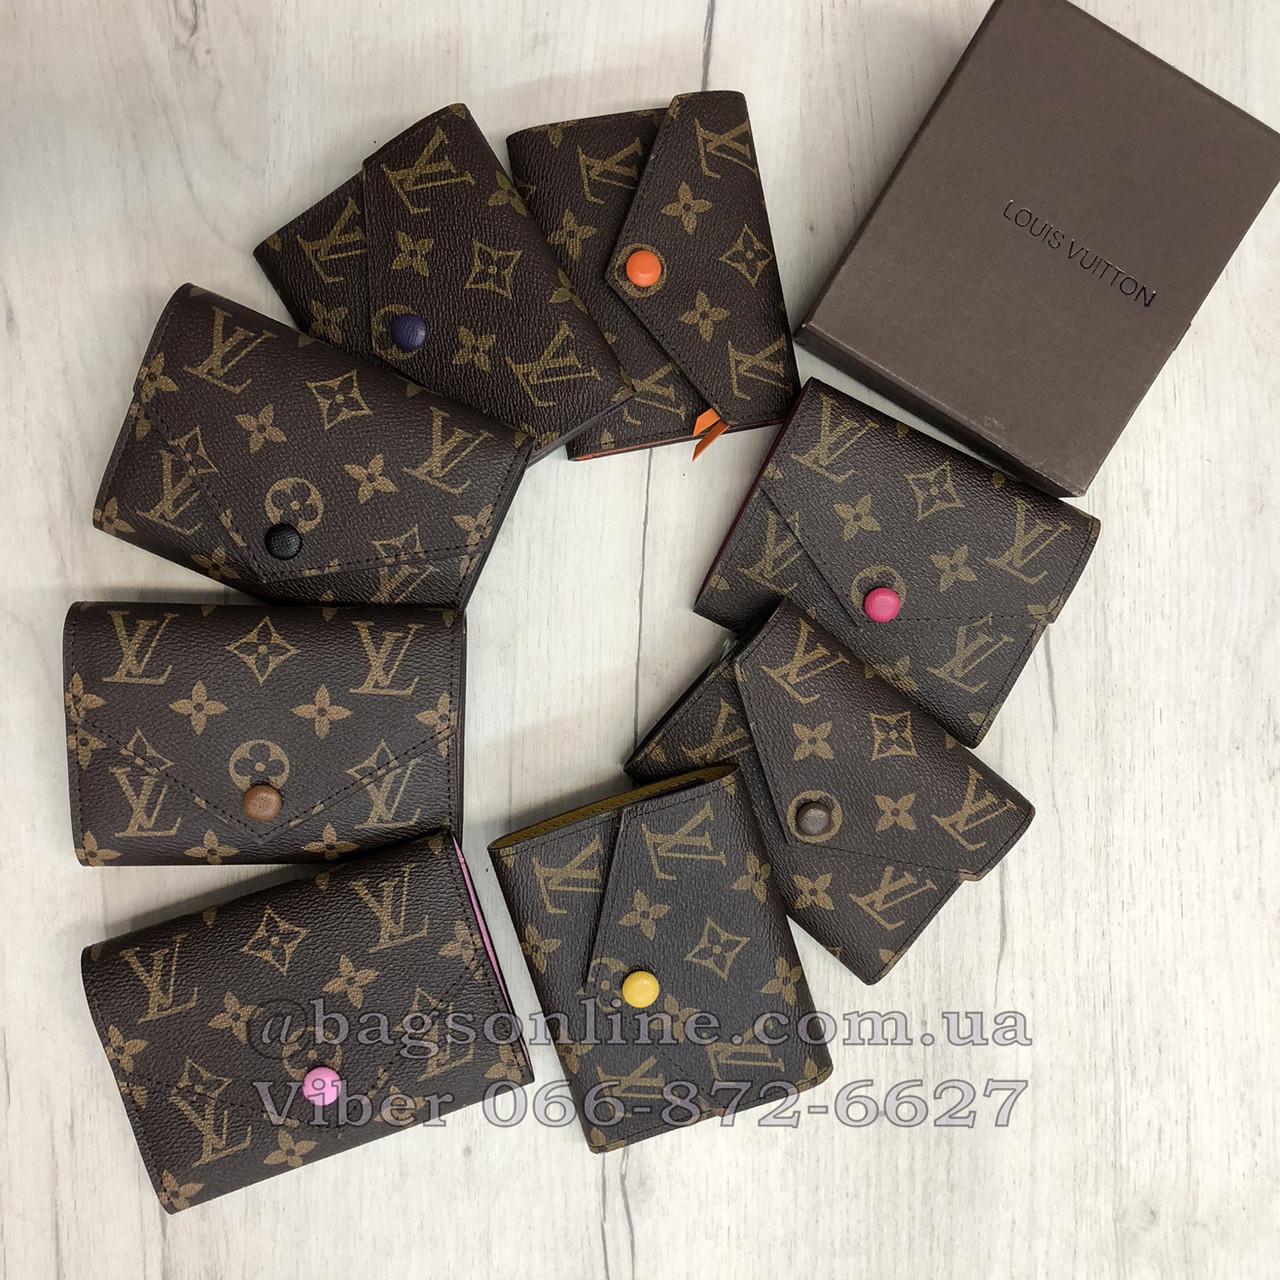 260edc940a09 Кошелек Louis Vuitton Monogram Мини на кнопке   lv монограм   Луи Витон  Кофейный